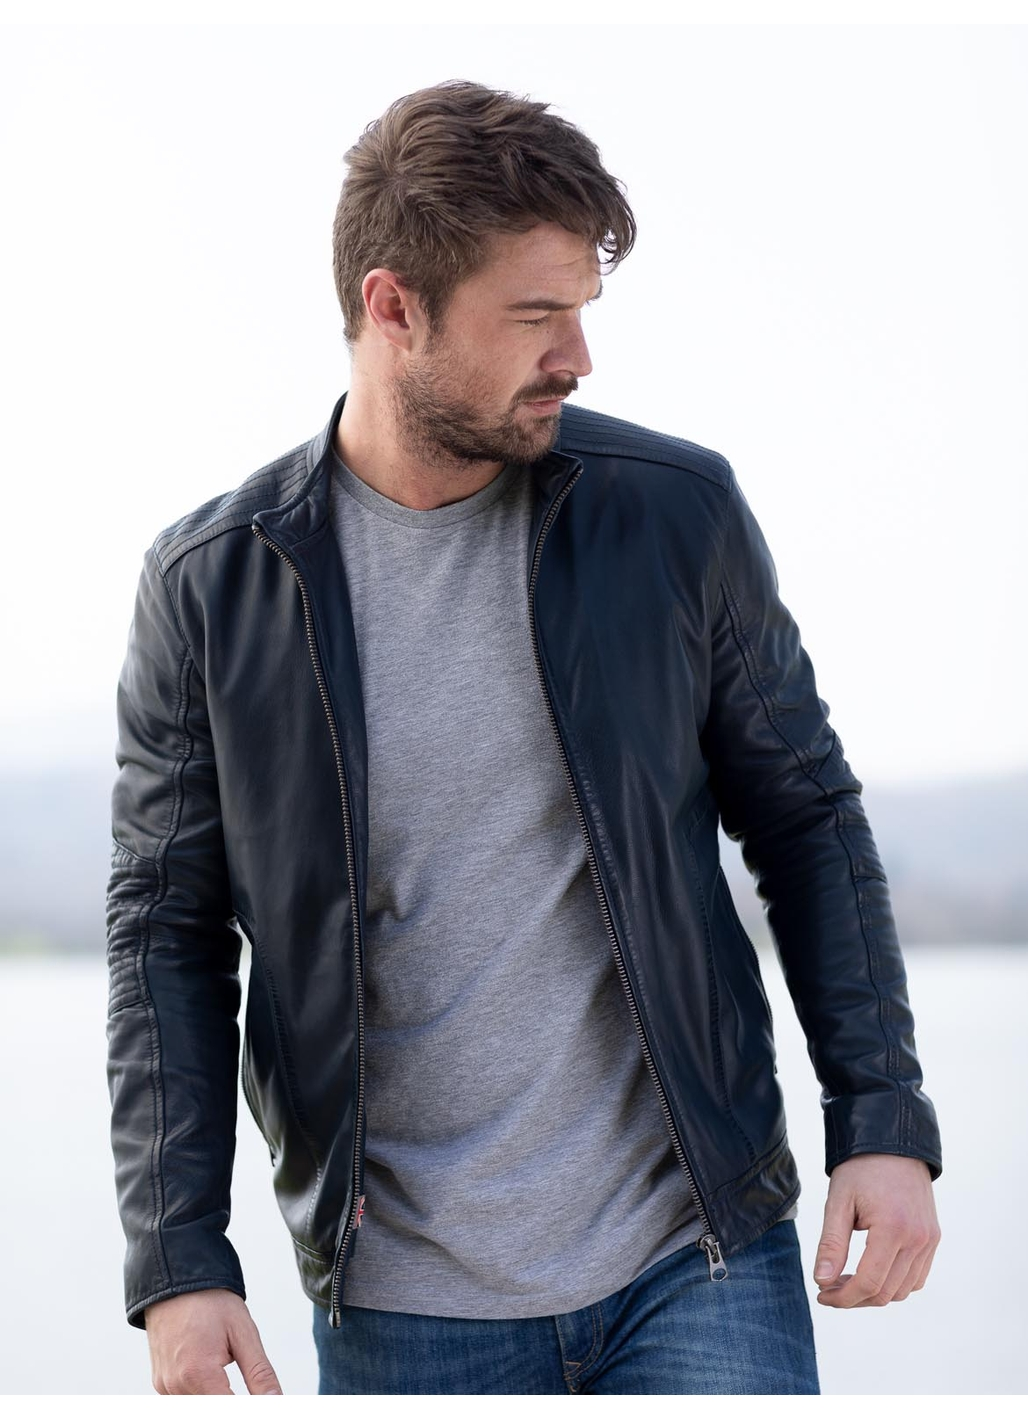 Greystoke Leather Jacket in Blue Night